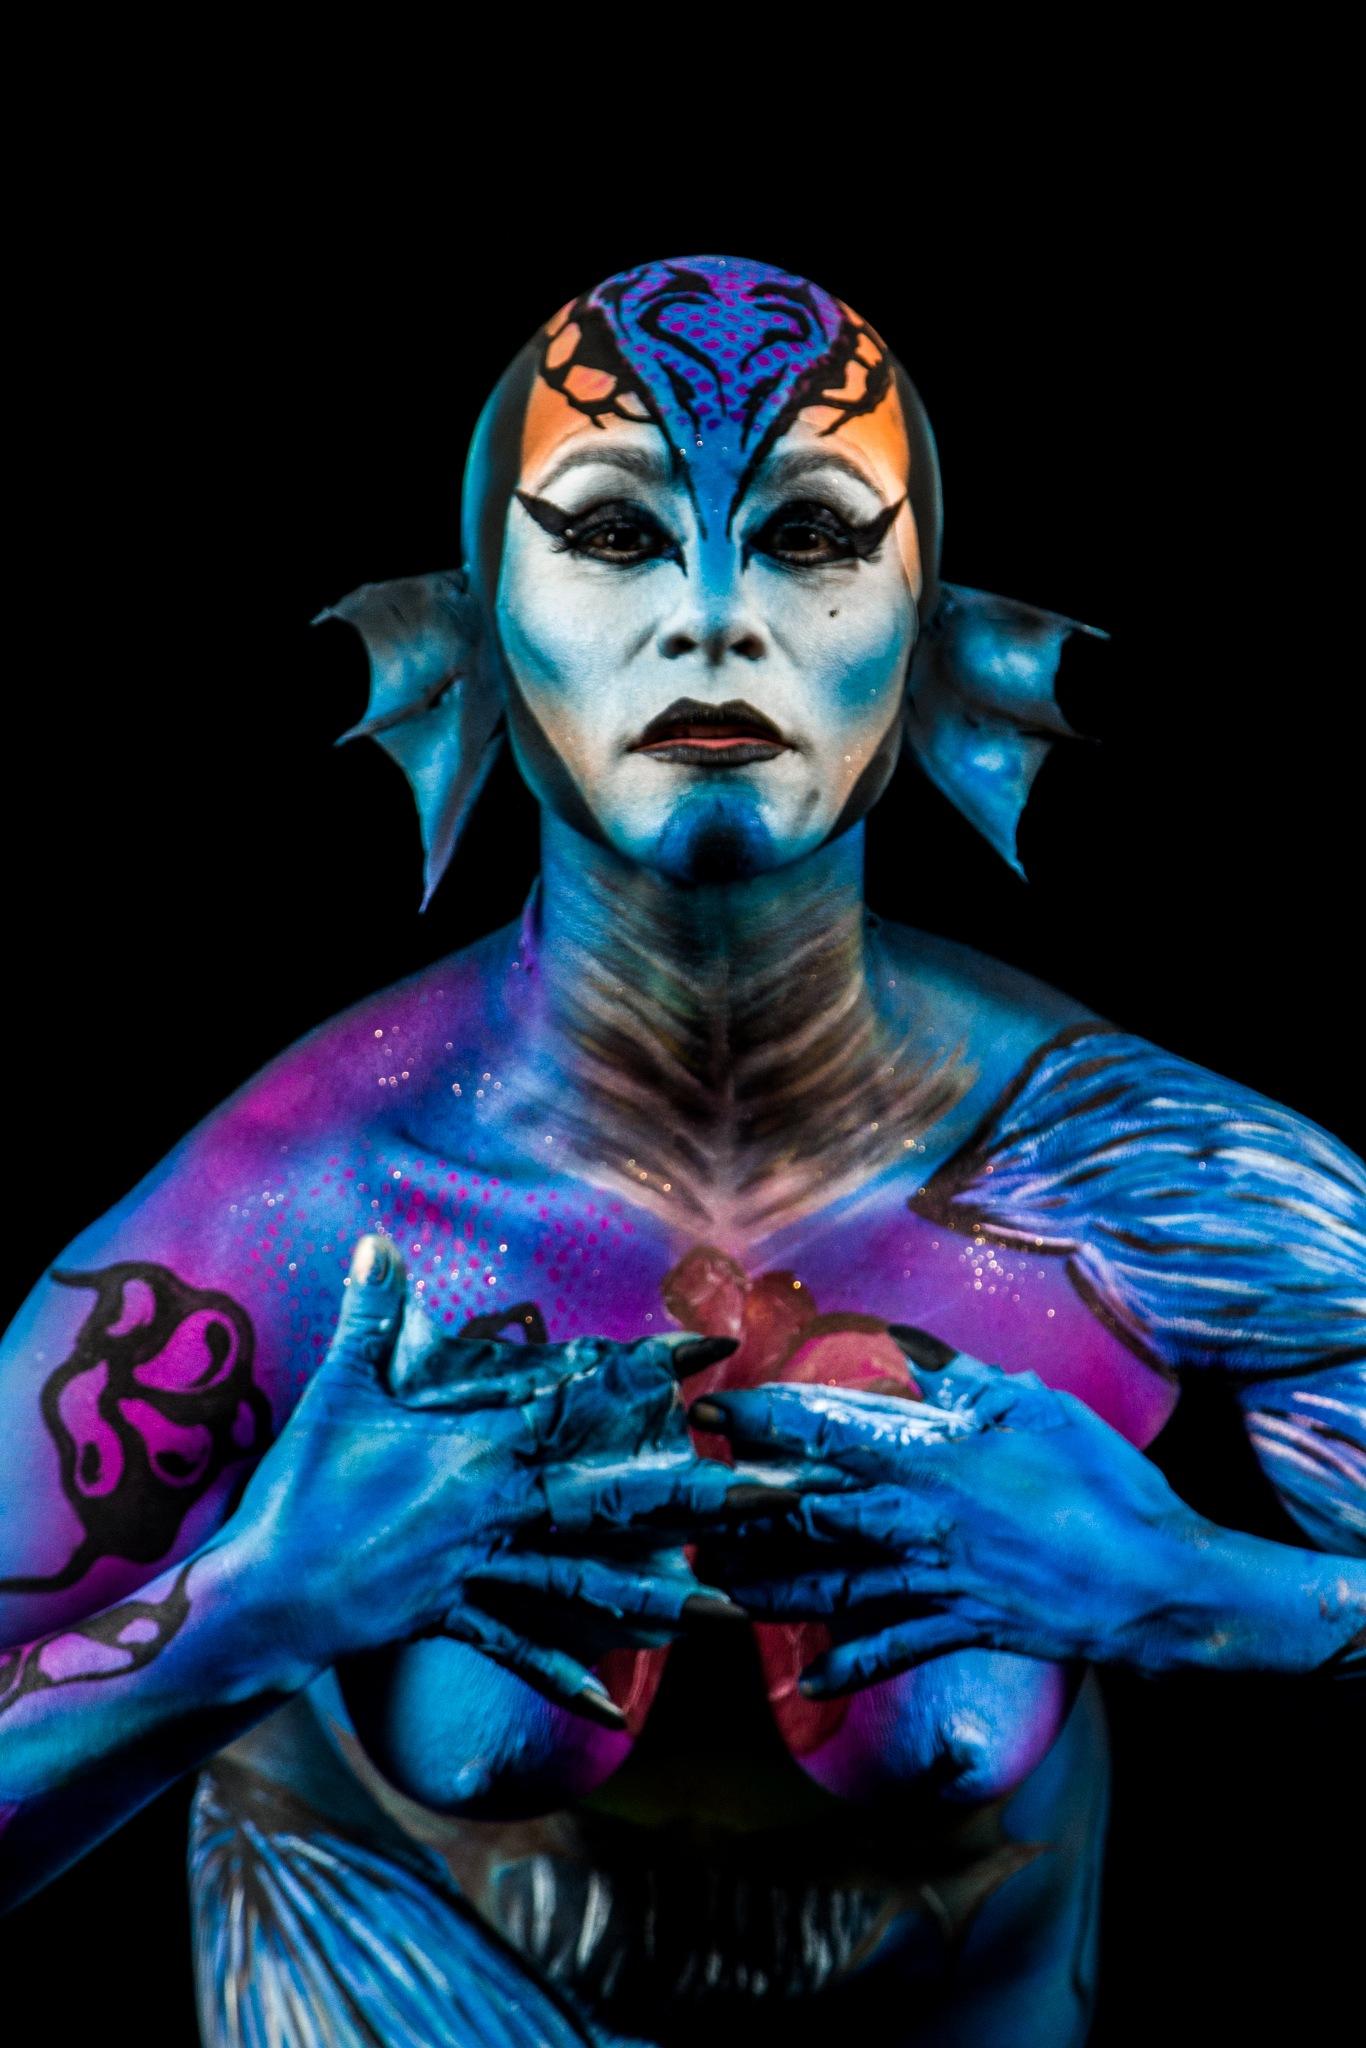 Body art by Daniel Felipe Restrepo Estrada